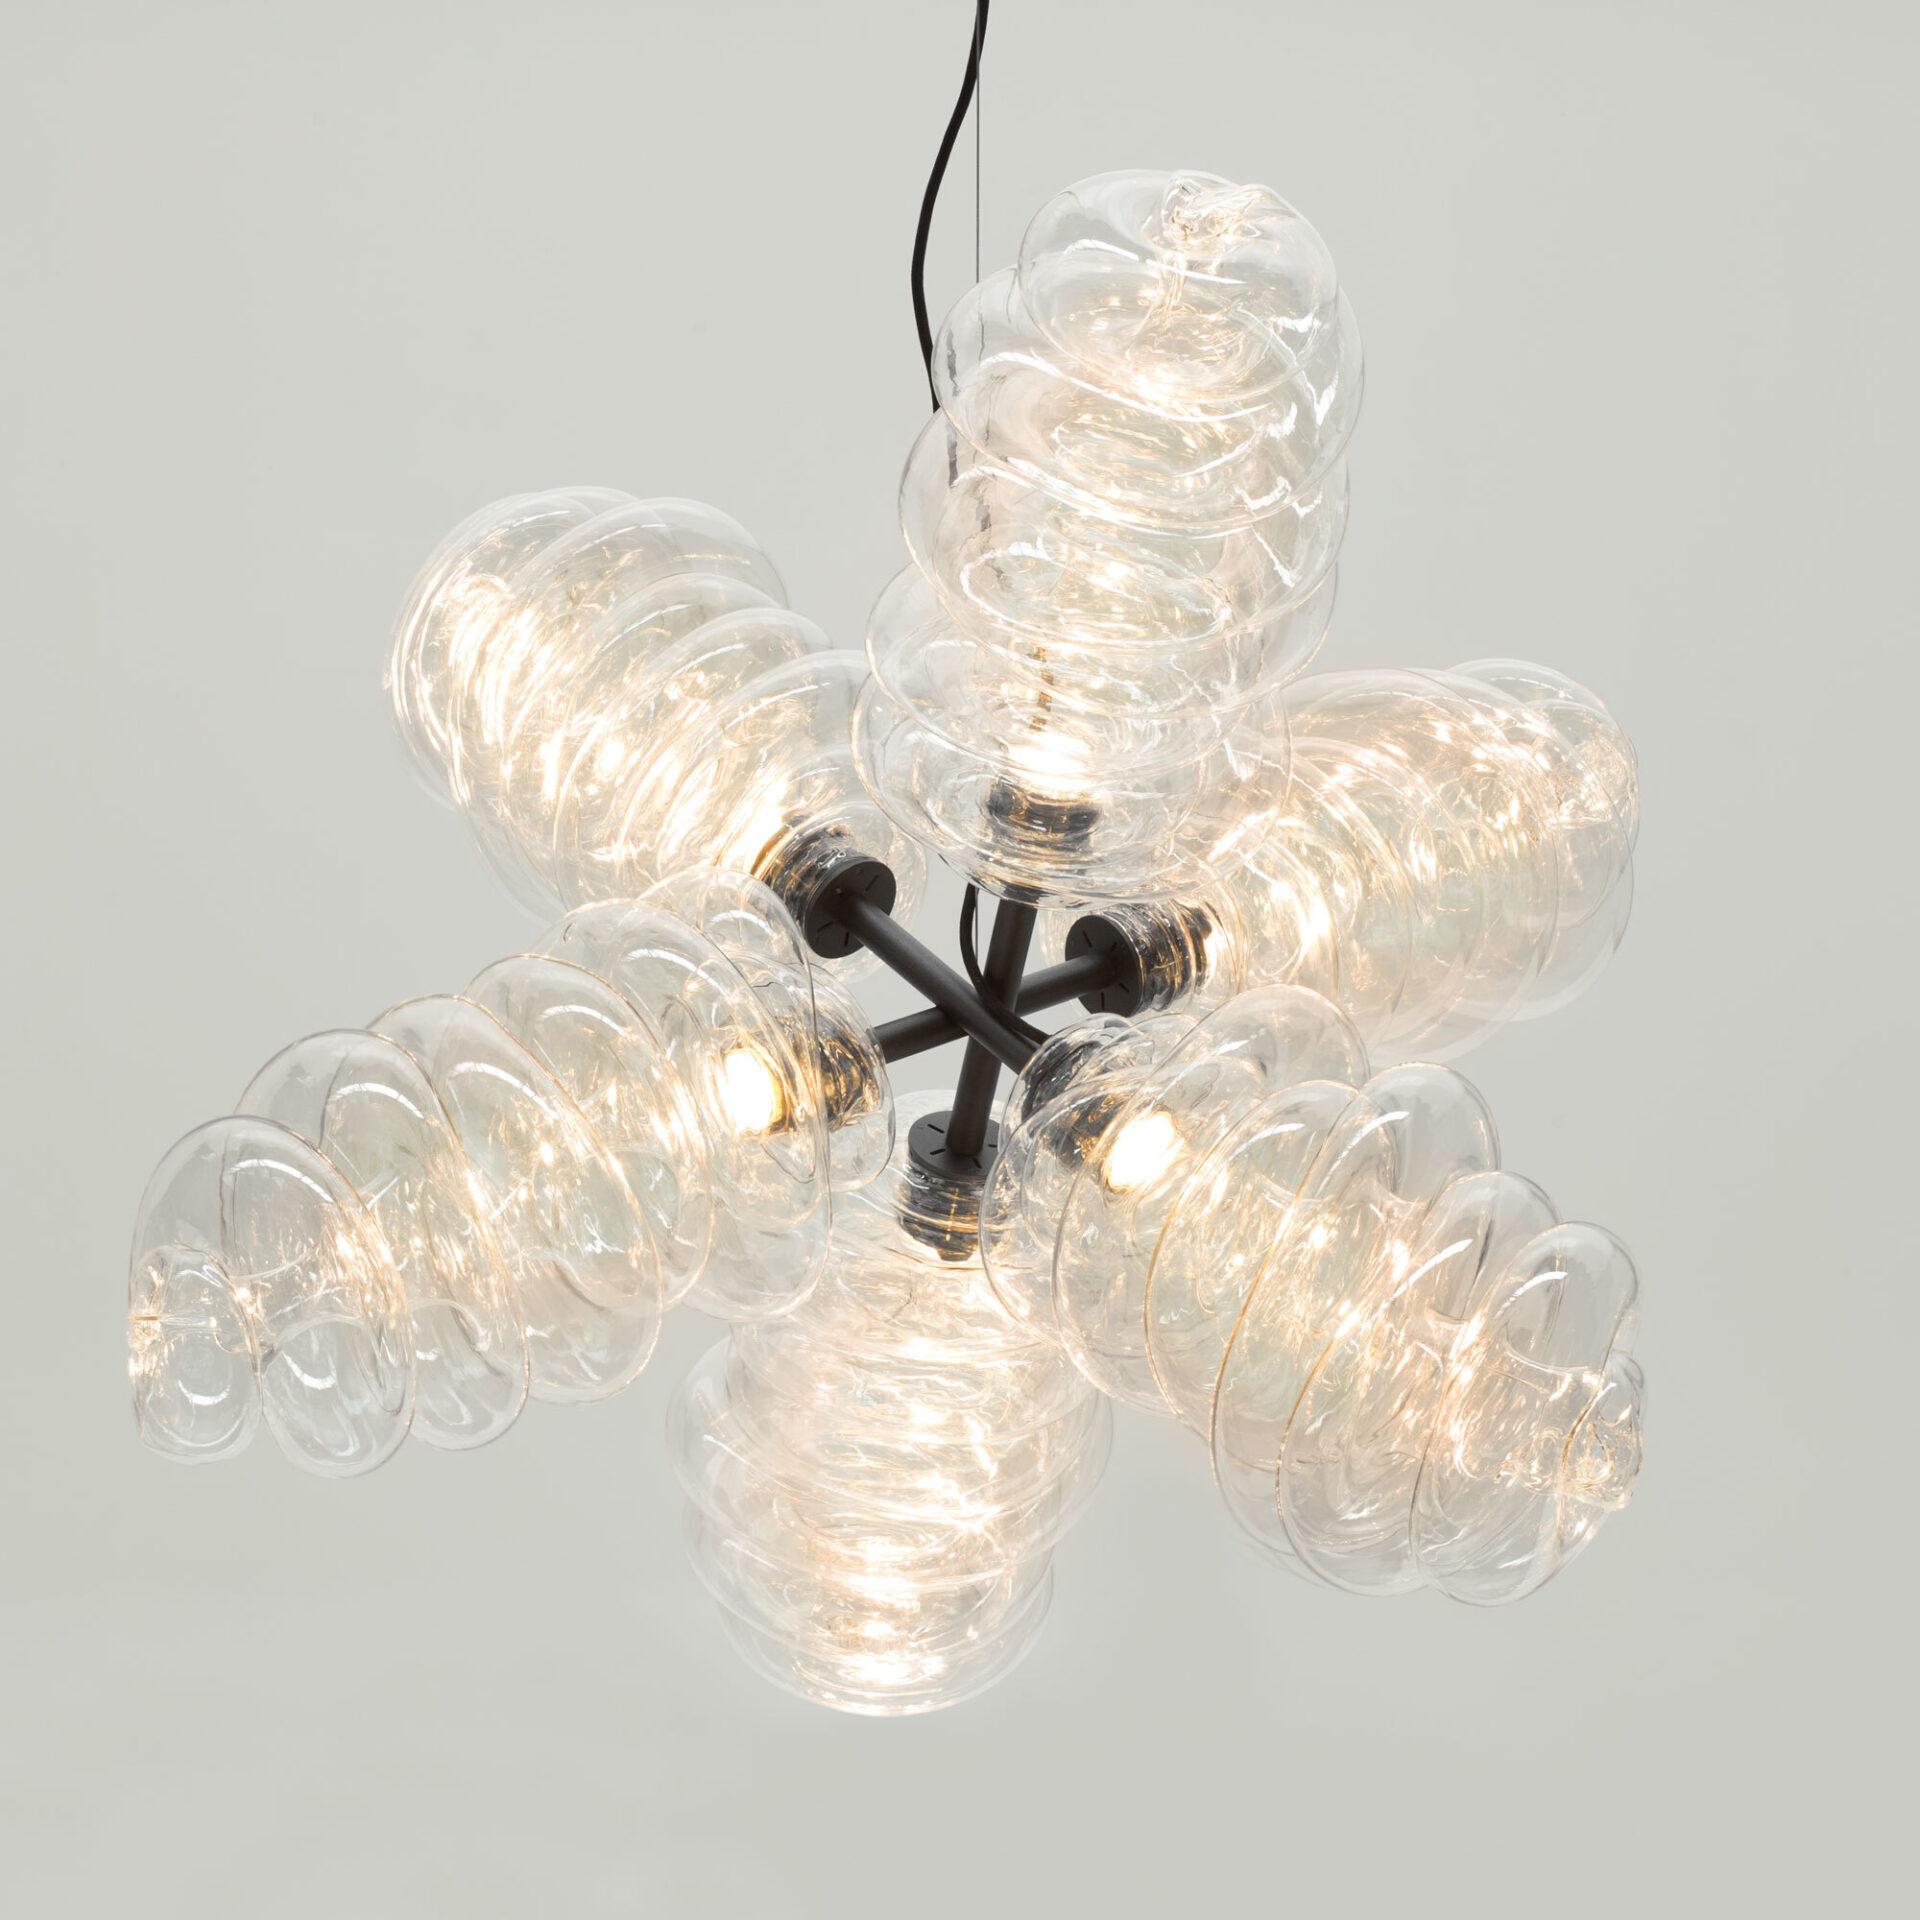 Bloown chandelier big web